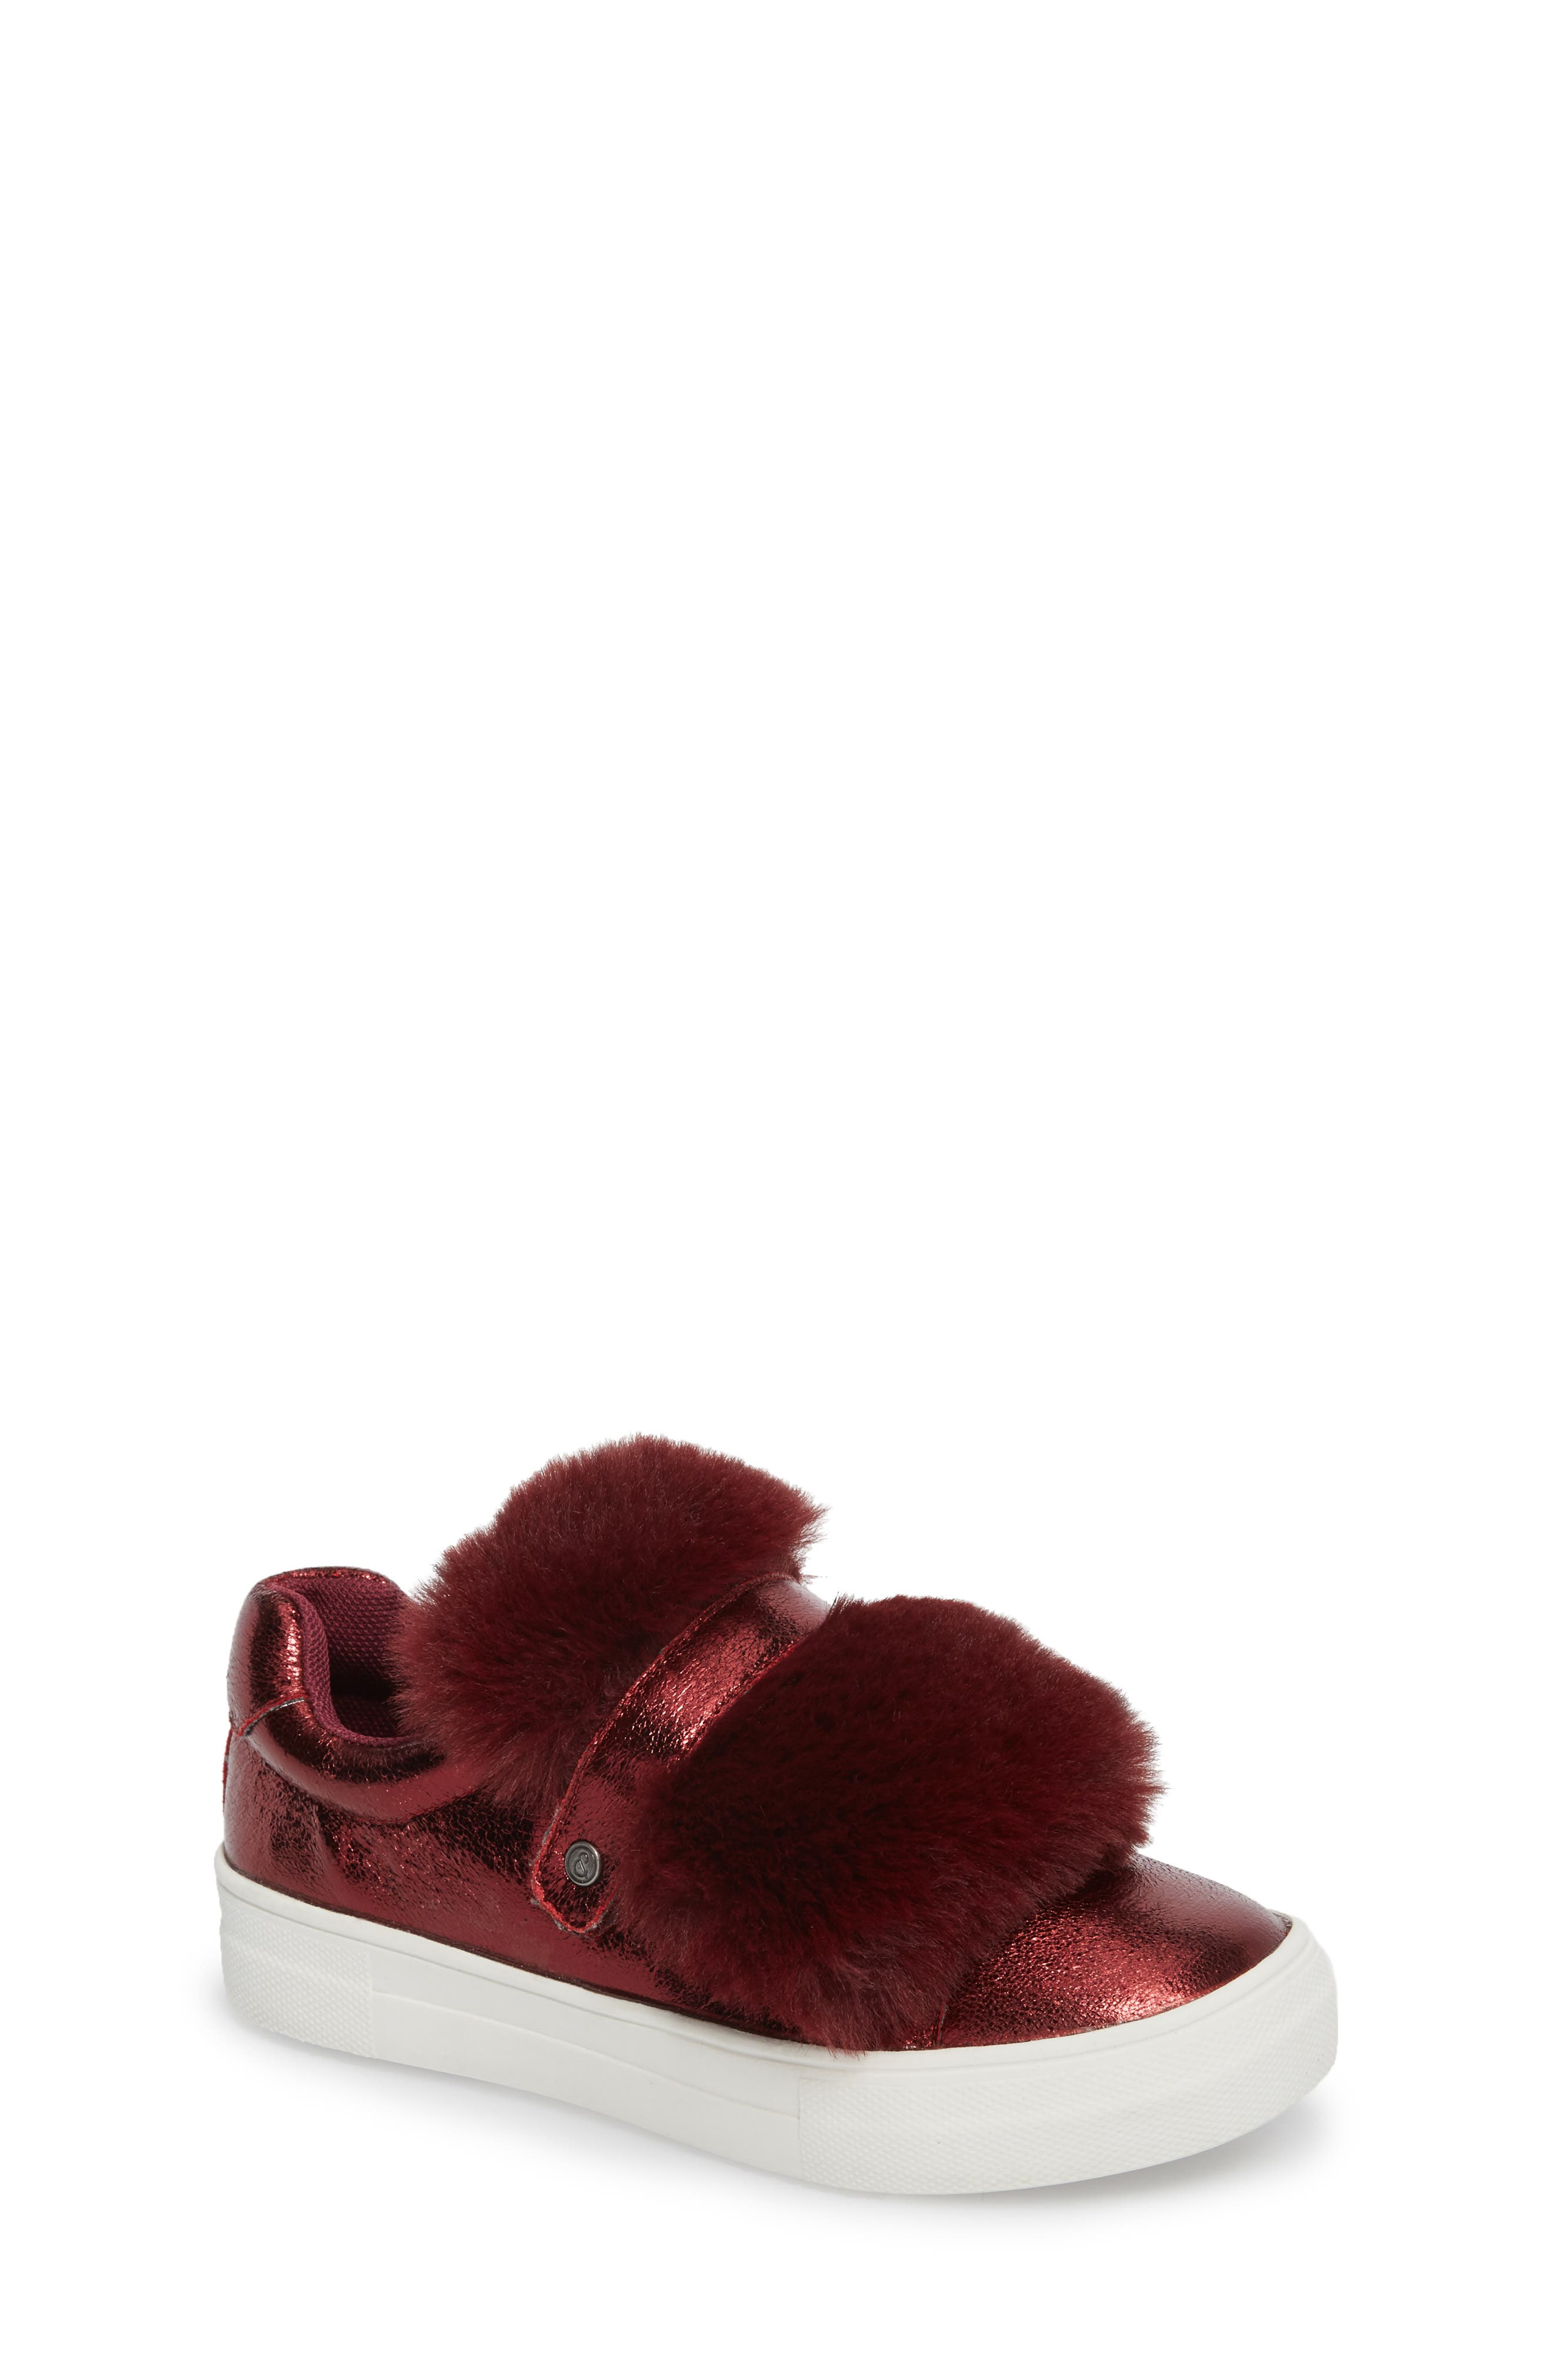 Zandra Faux Fur Metallic Sneaker,                             Main thumbnail 1, color,                             Burgundy Faux Leather